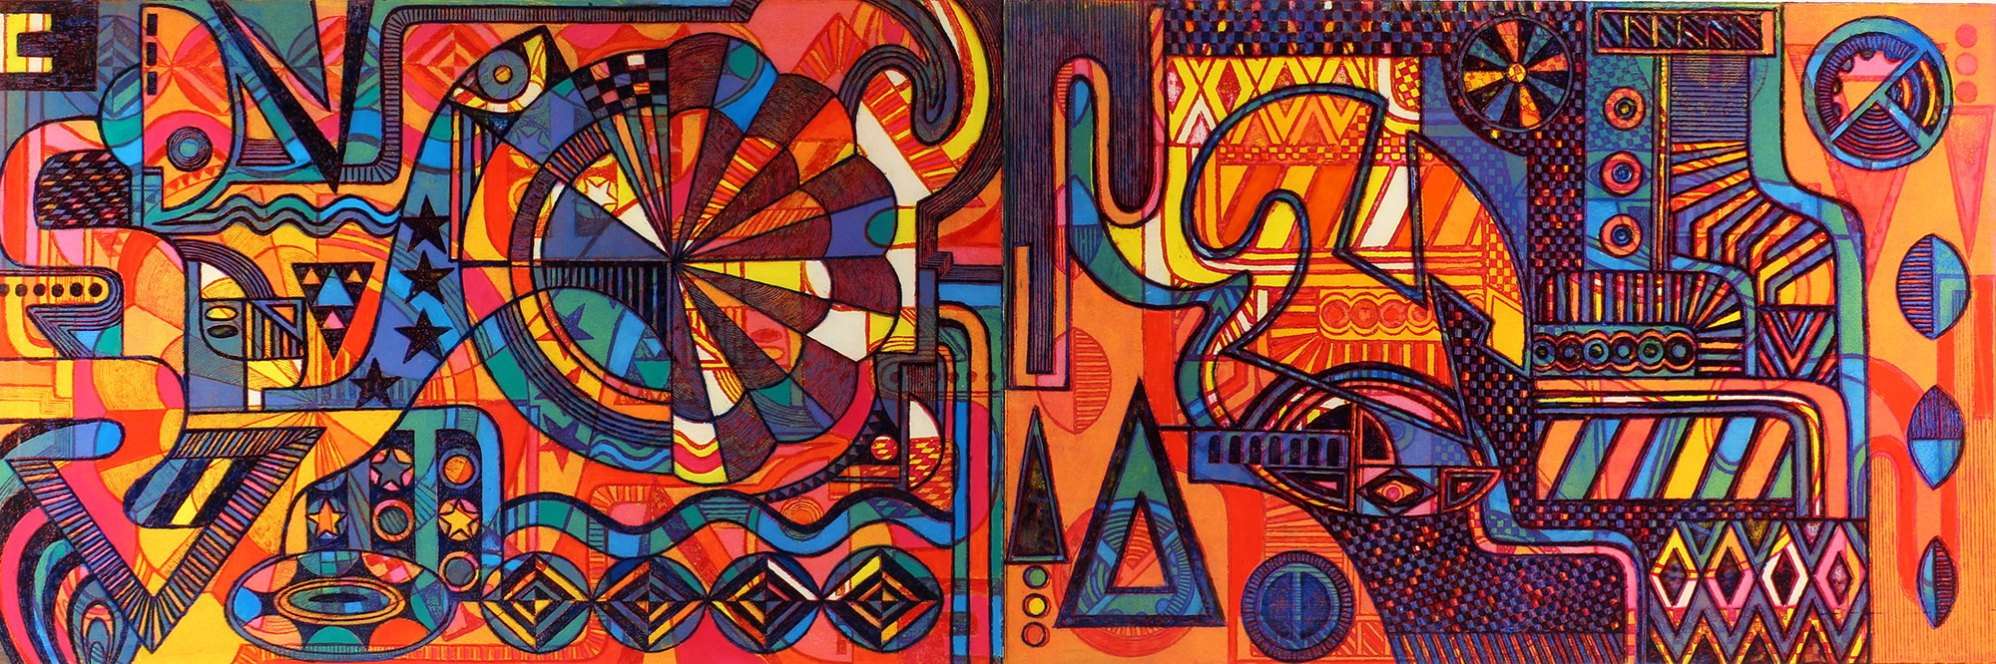 "Transcendentalism II 23.5"" x 72"" Etching on Paper"